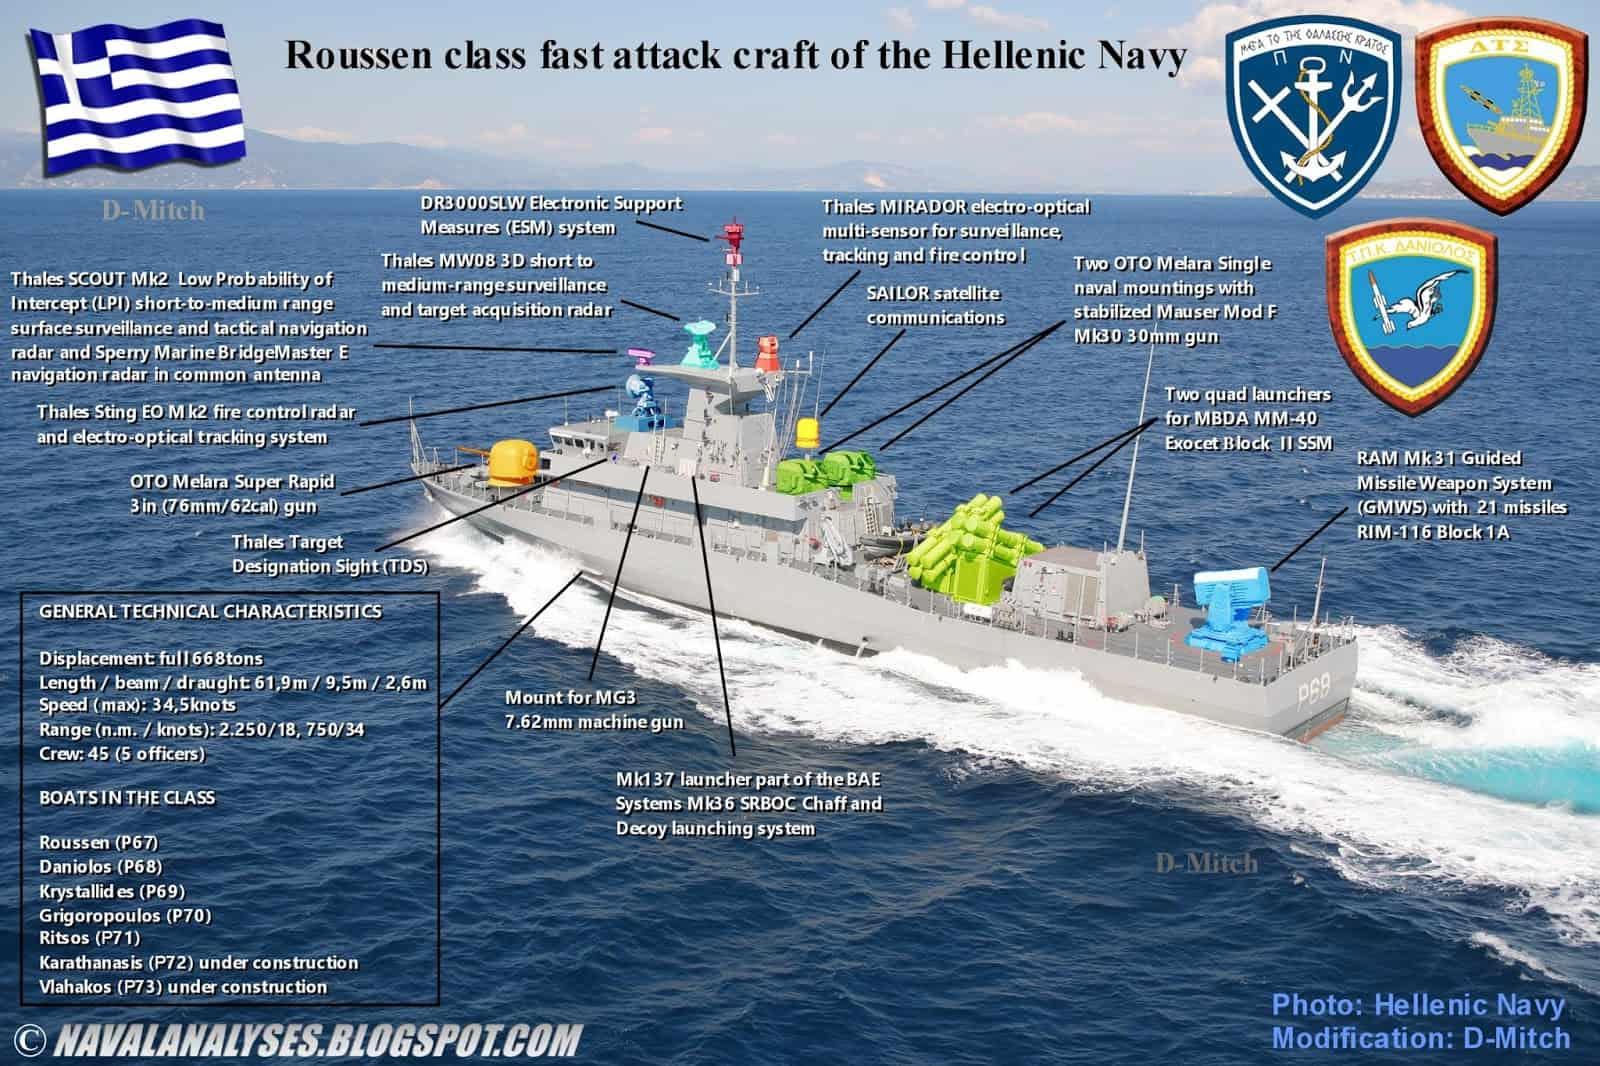 Інфографіка по ракетному катеру класу Roussen